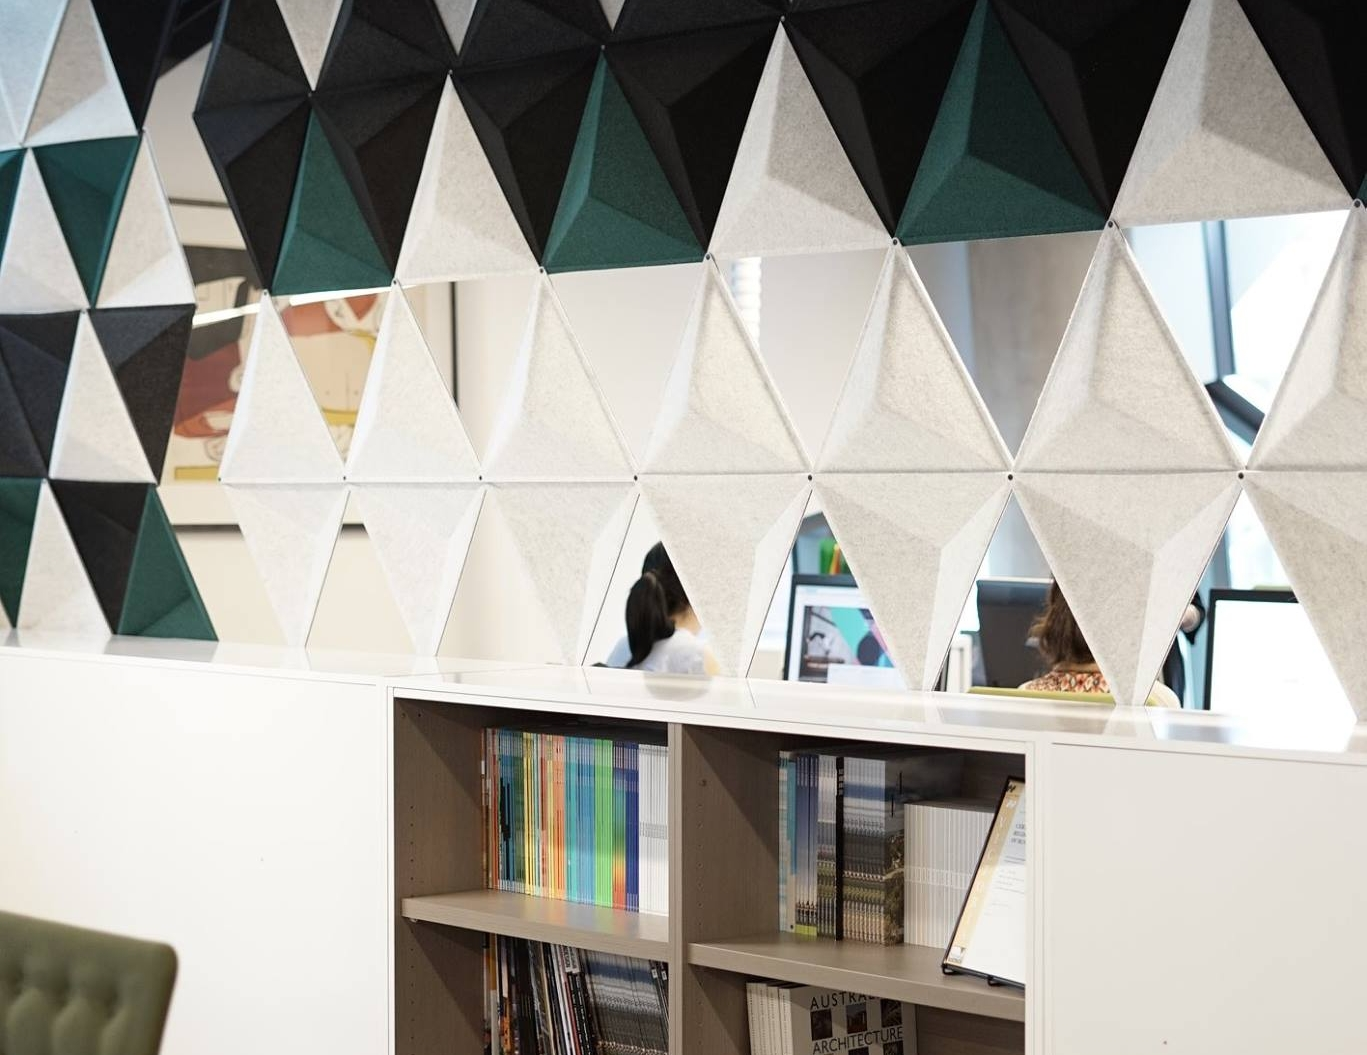 Australia Institute of Architects  Melbourne CBD - Victoria